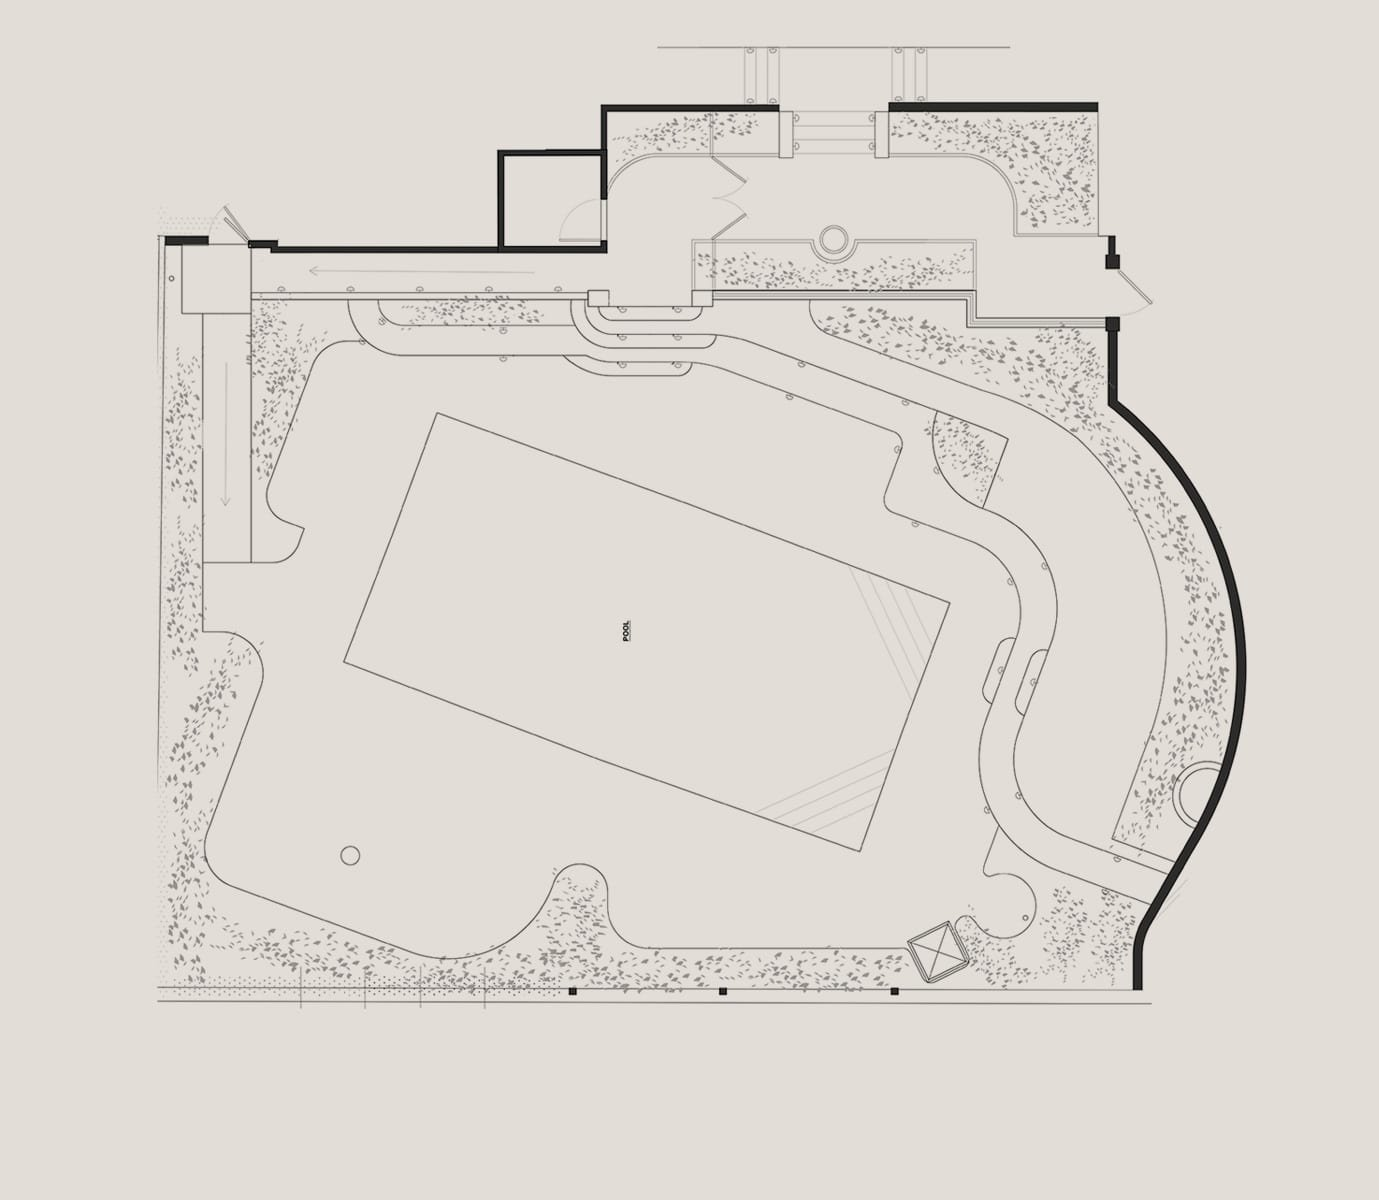 joaquin-floorplan-1-min (3).jpg